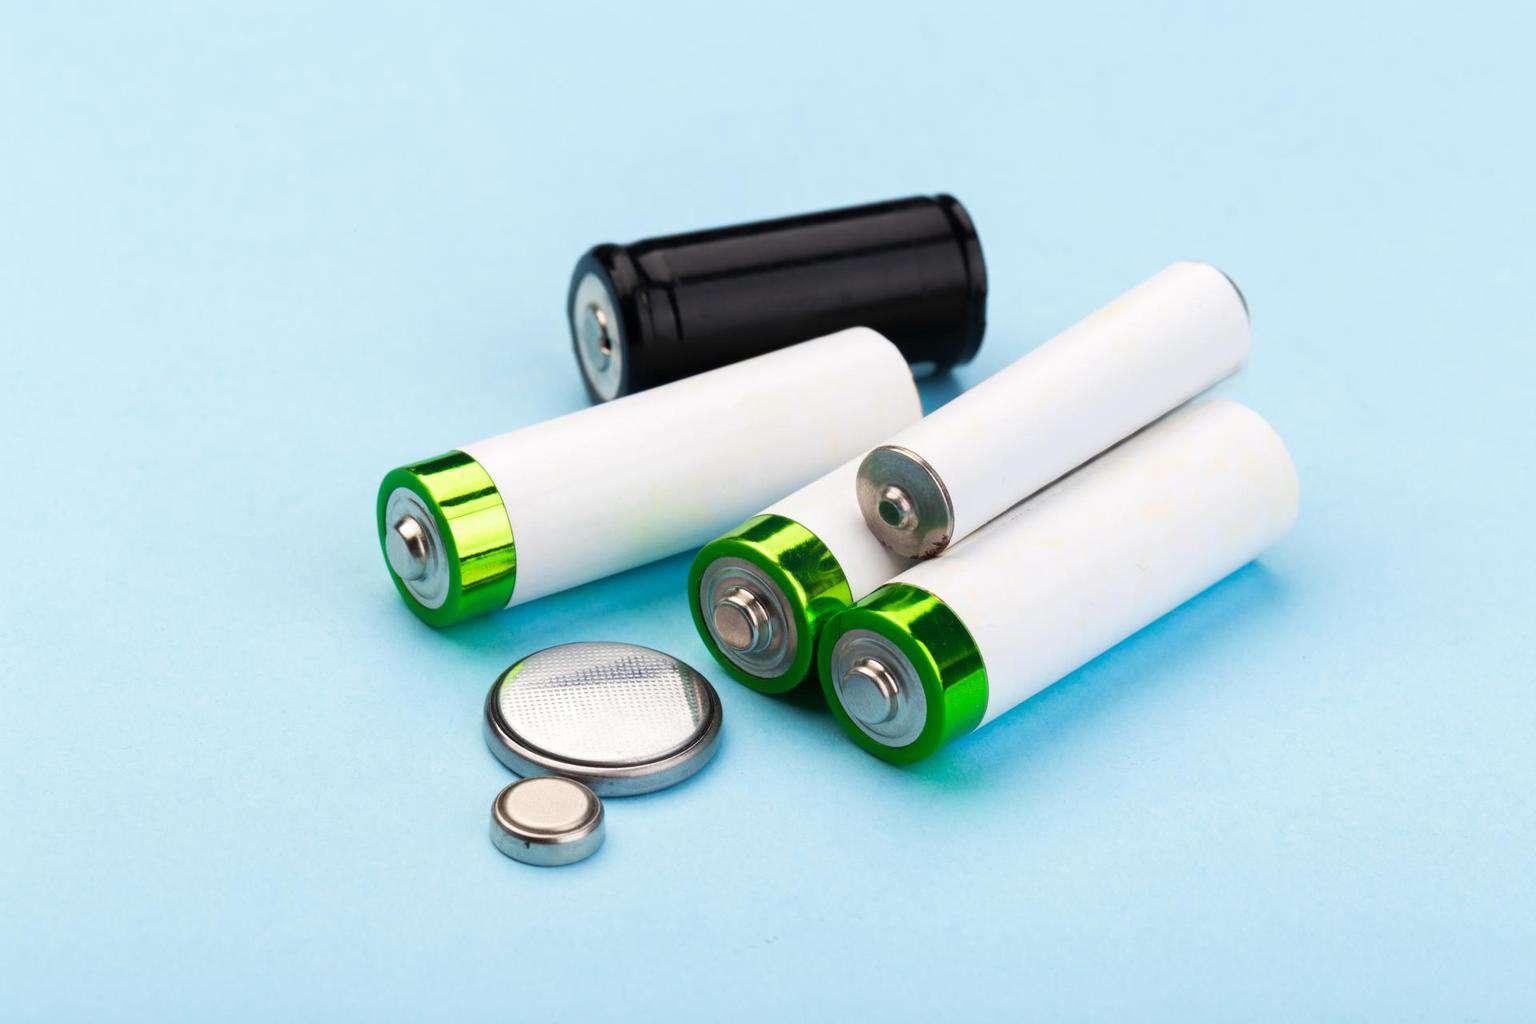 Solid Power will ab 2022 Feststoffbatterien testen